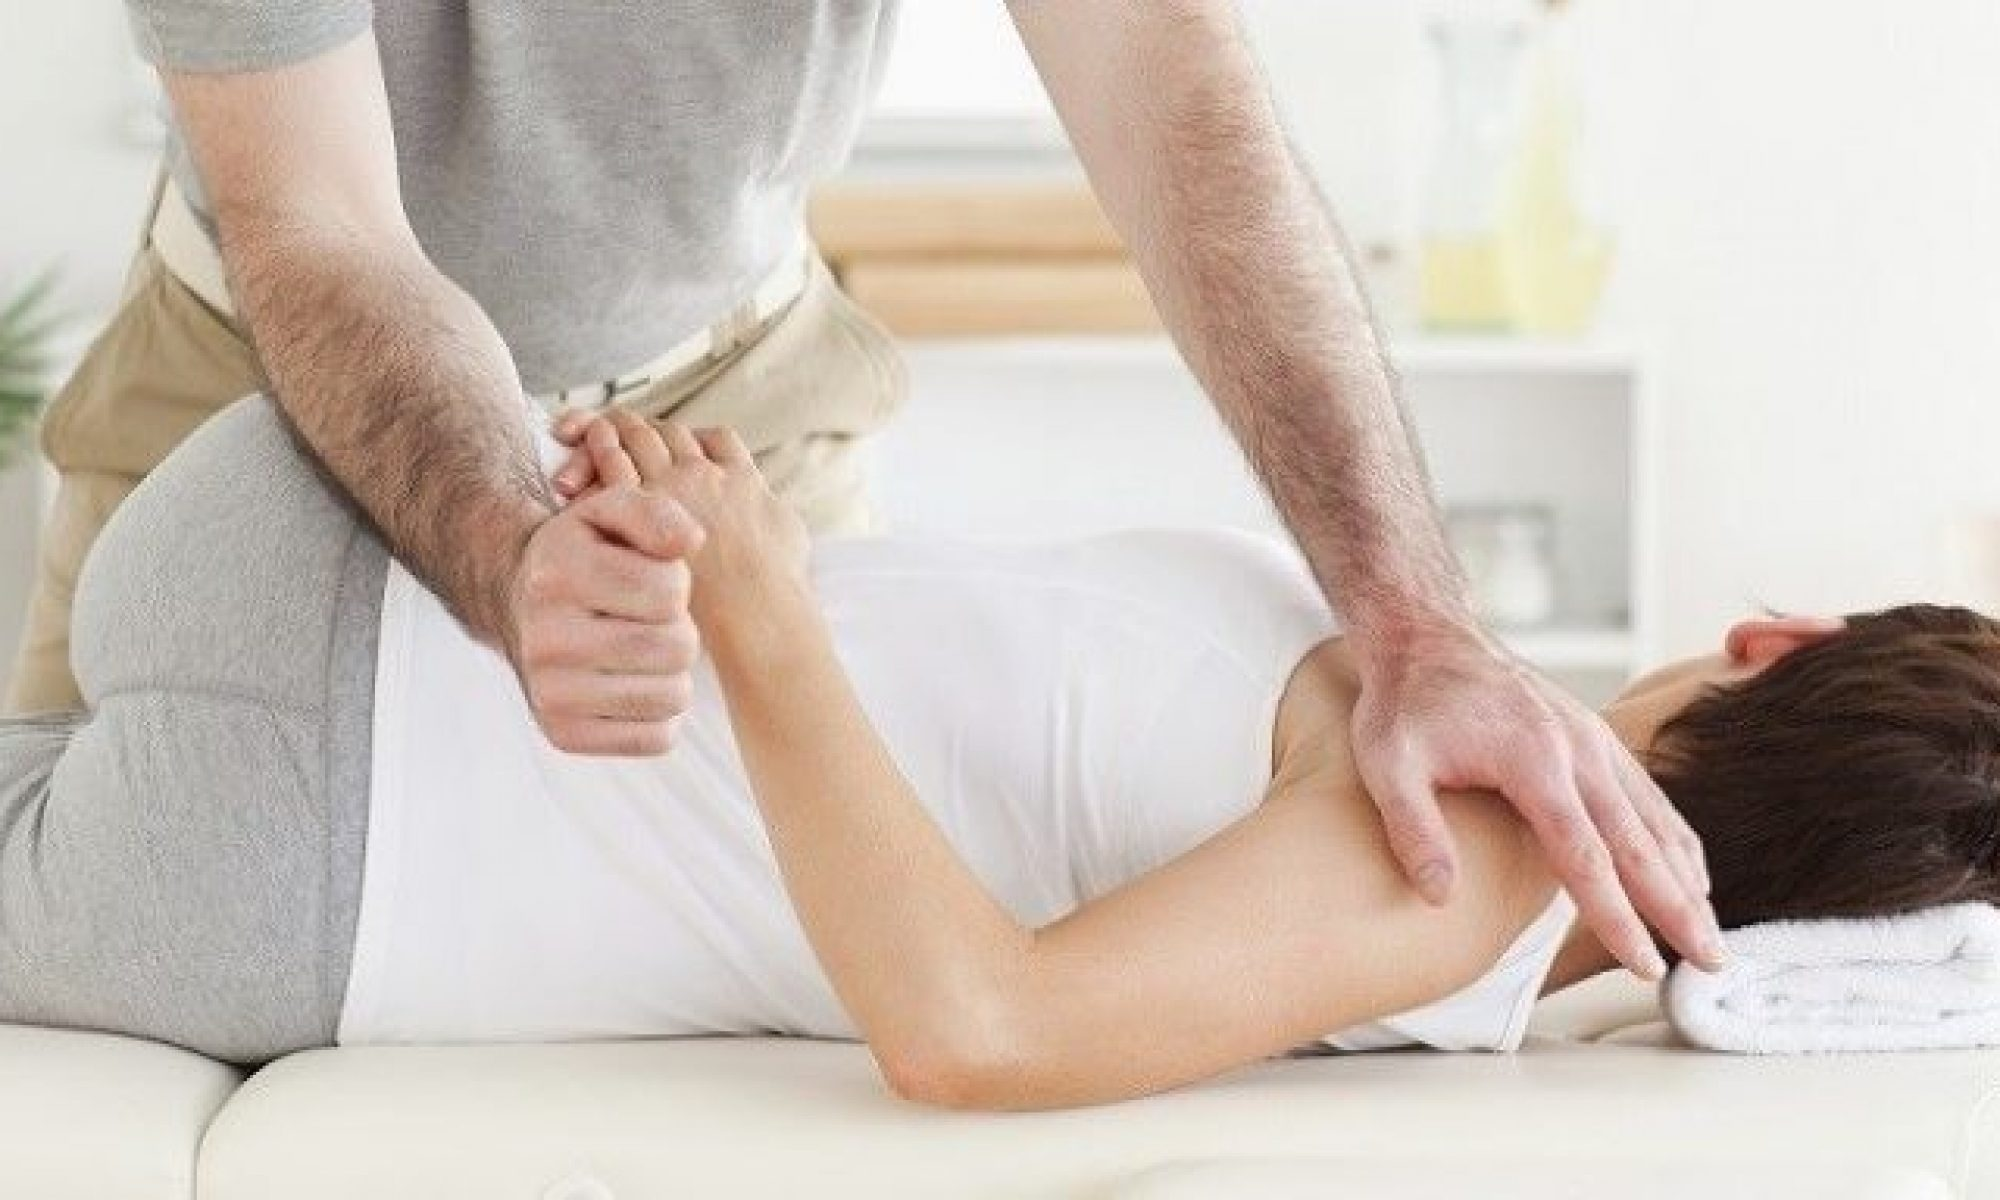 MassageGroothandel.nl